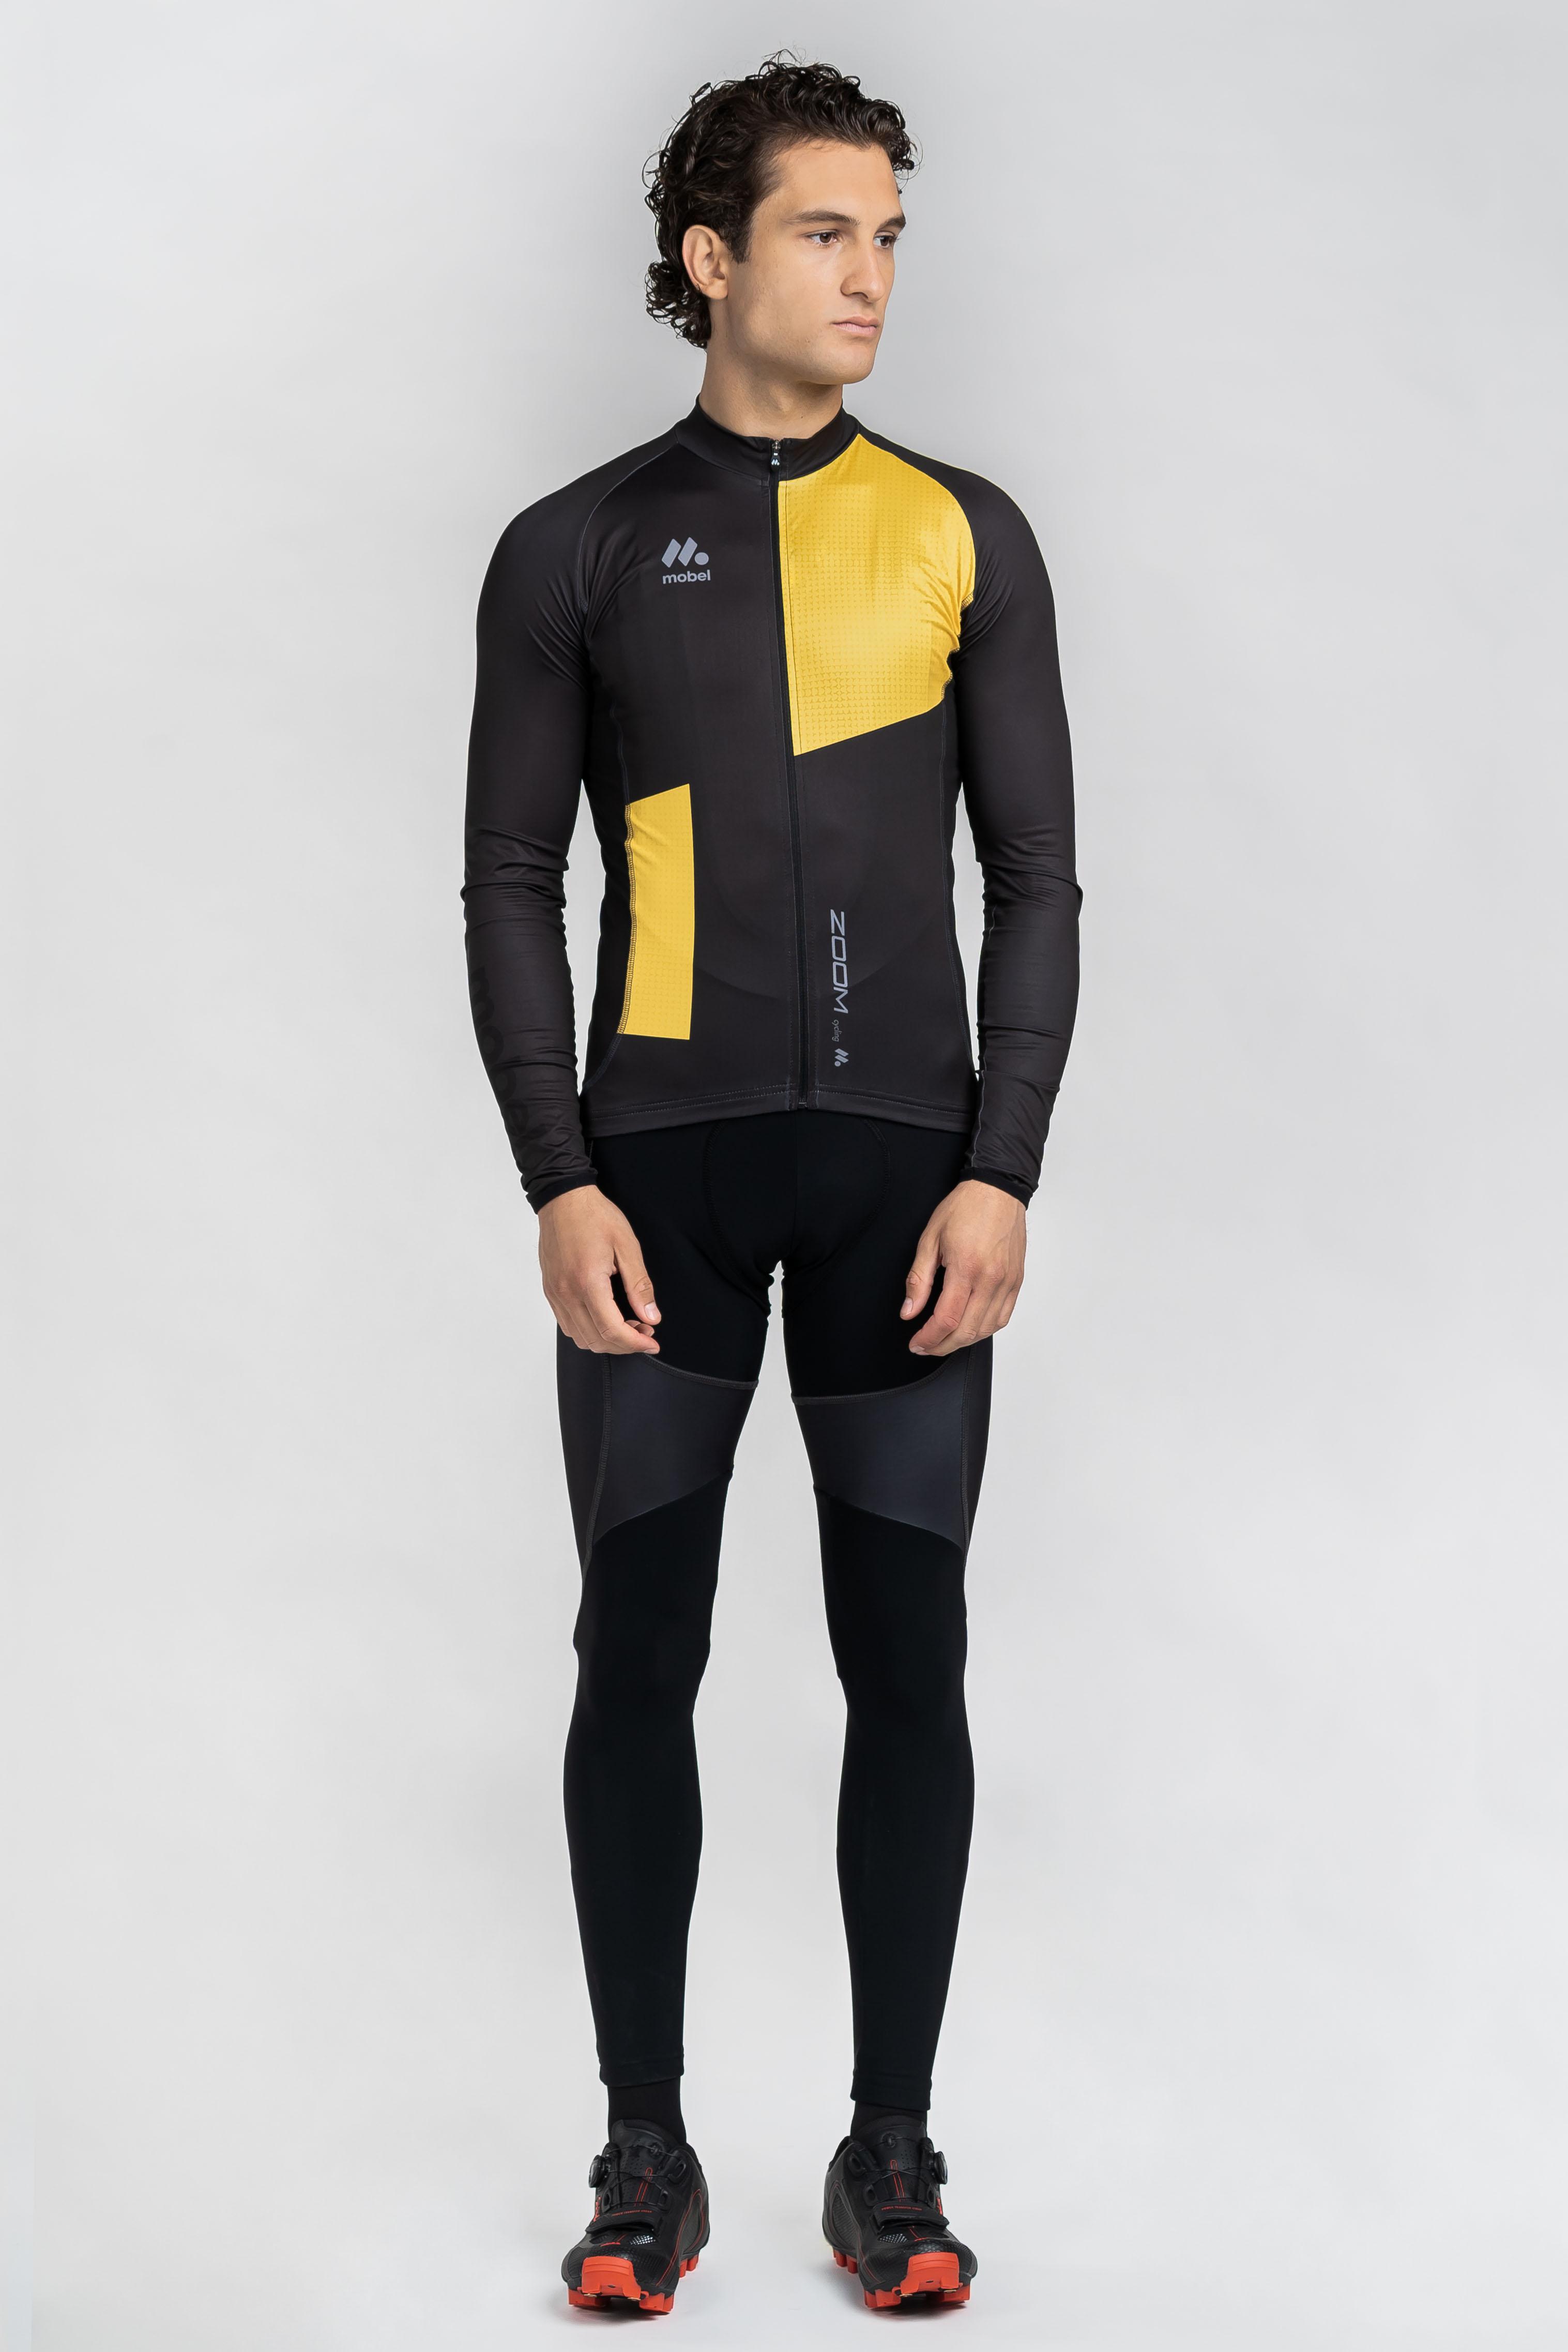 01 maillot manga larga culote largo ZOOM mobel sport